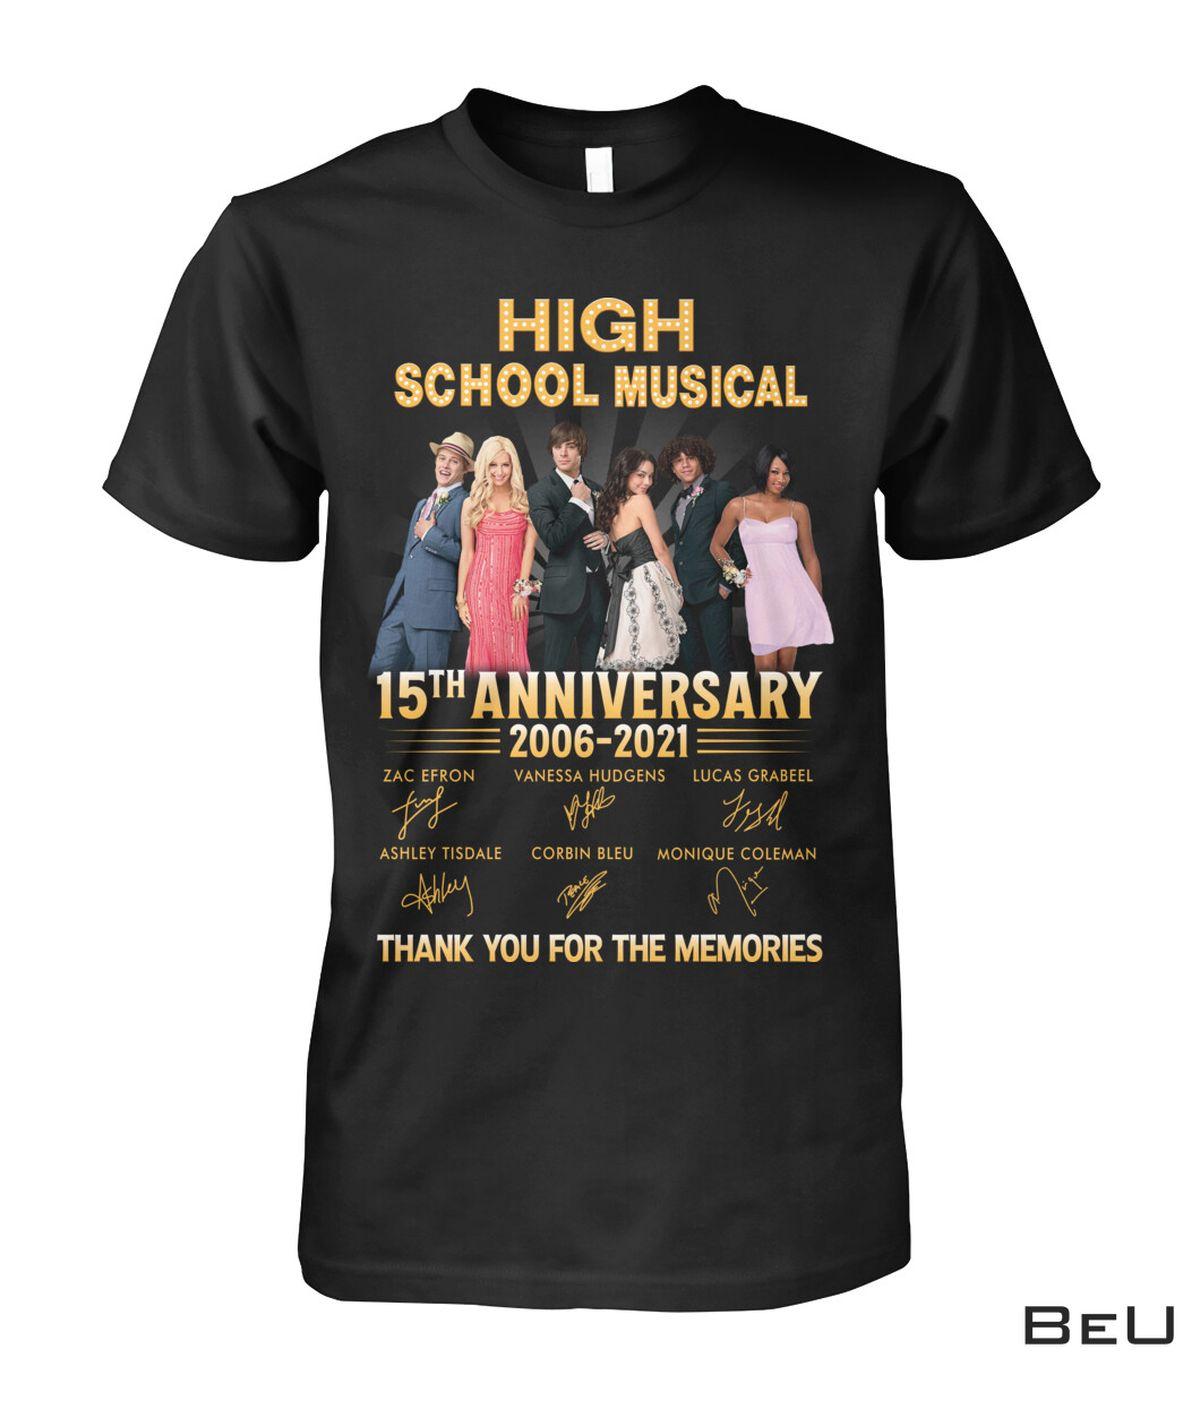 High School Musical 15th Anniversary Shirt, hoodie, tank top